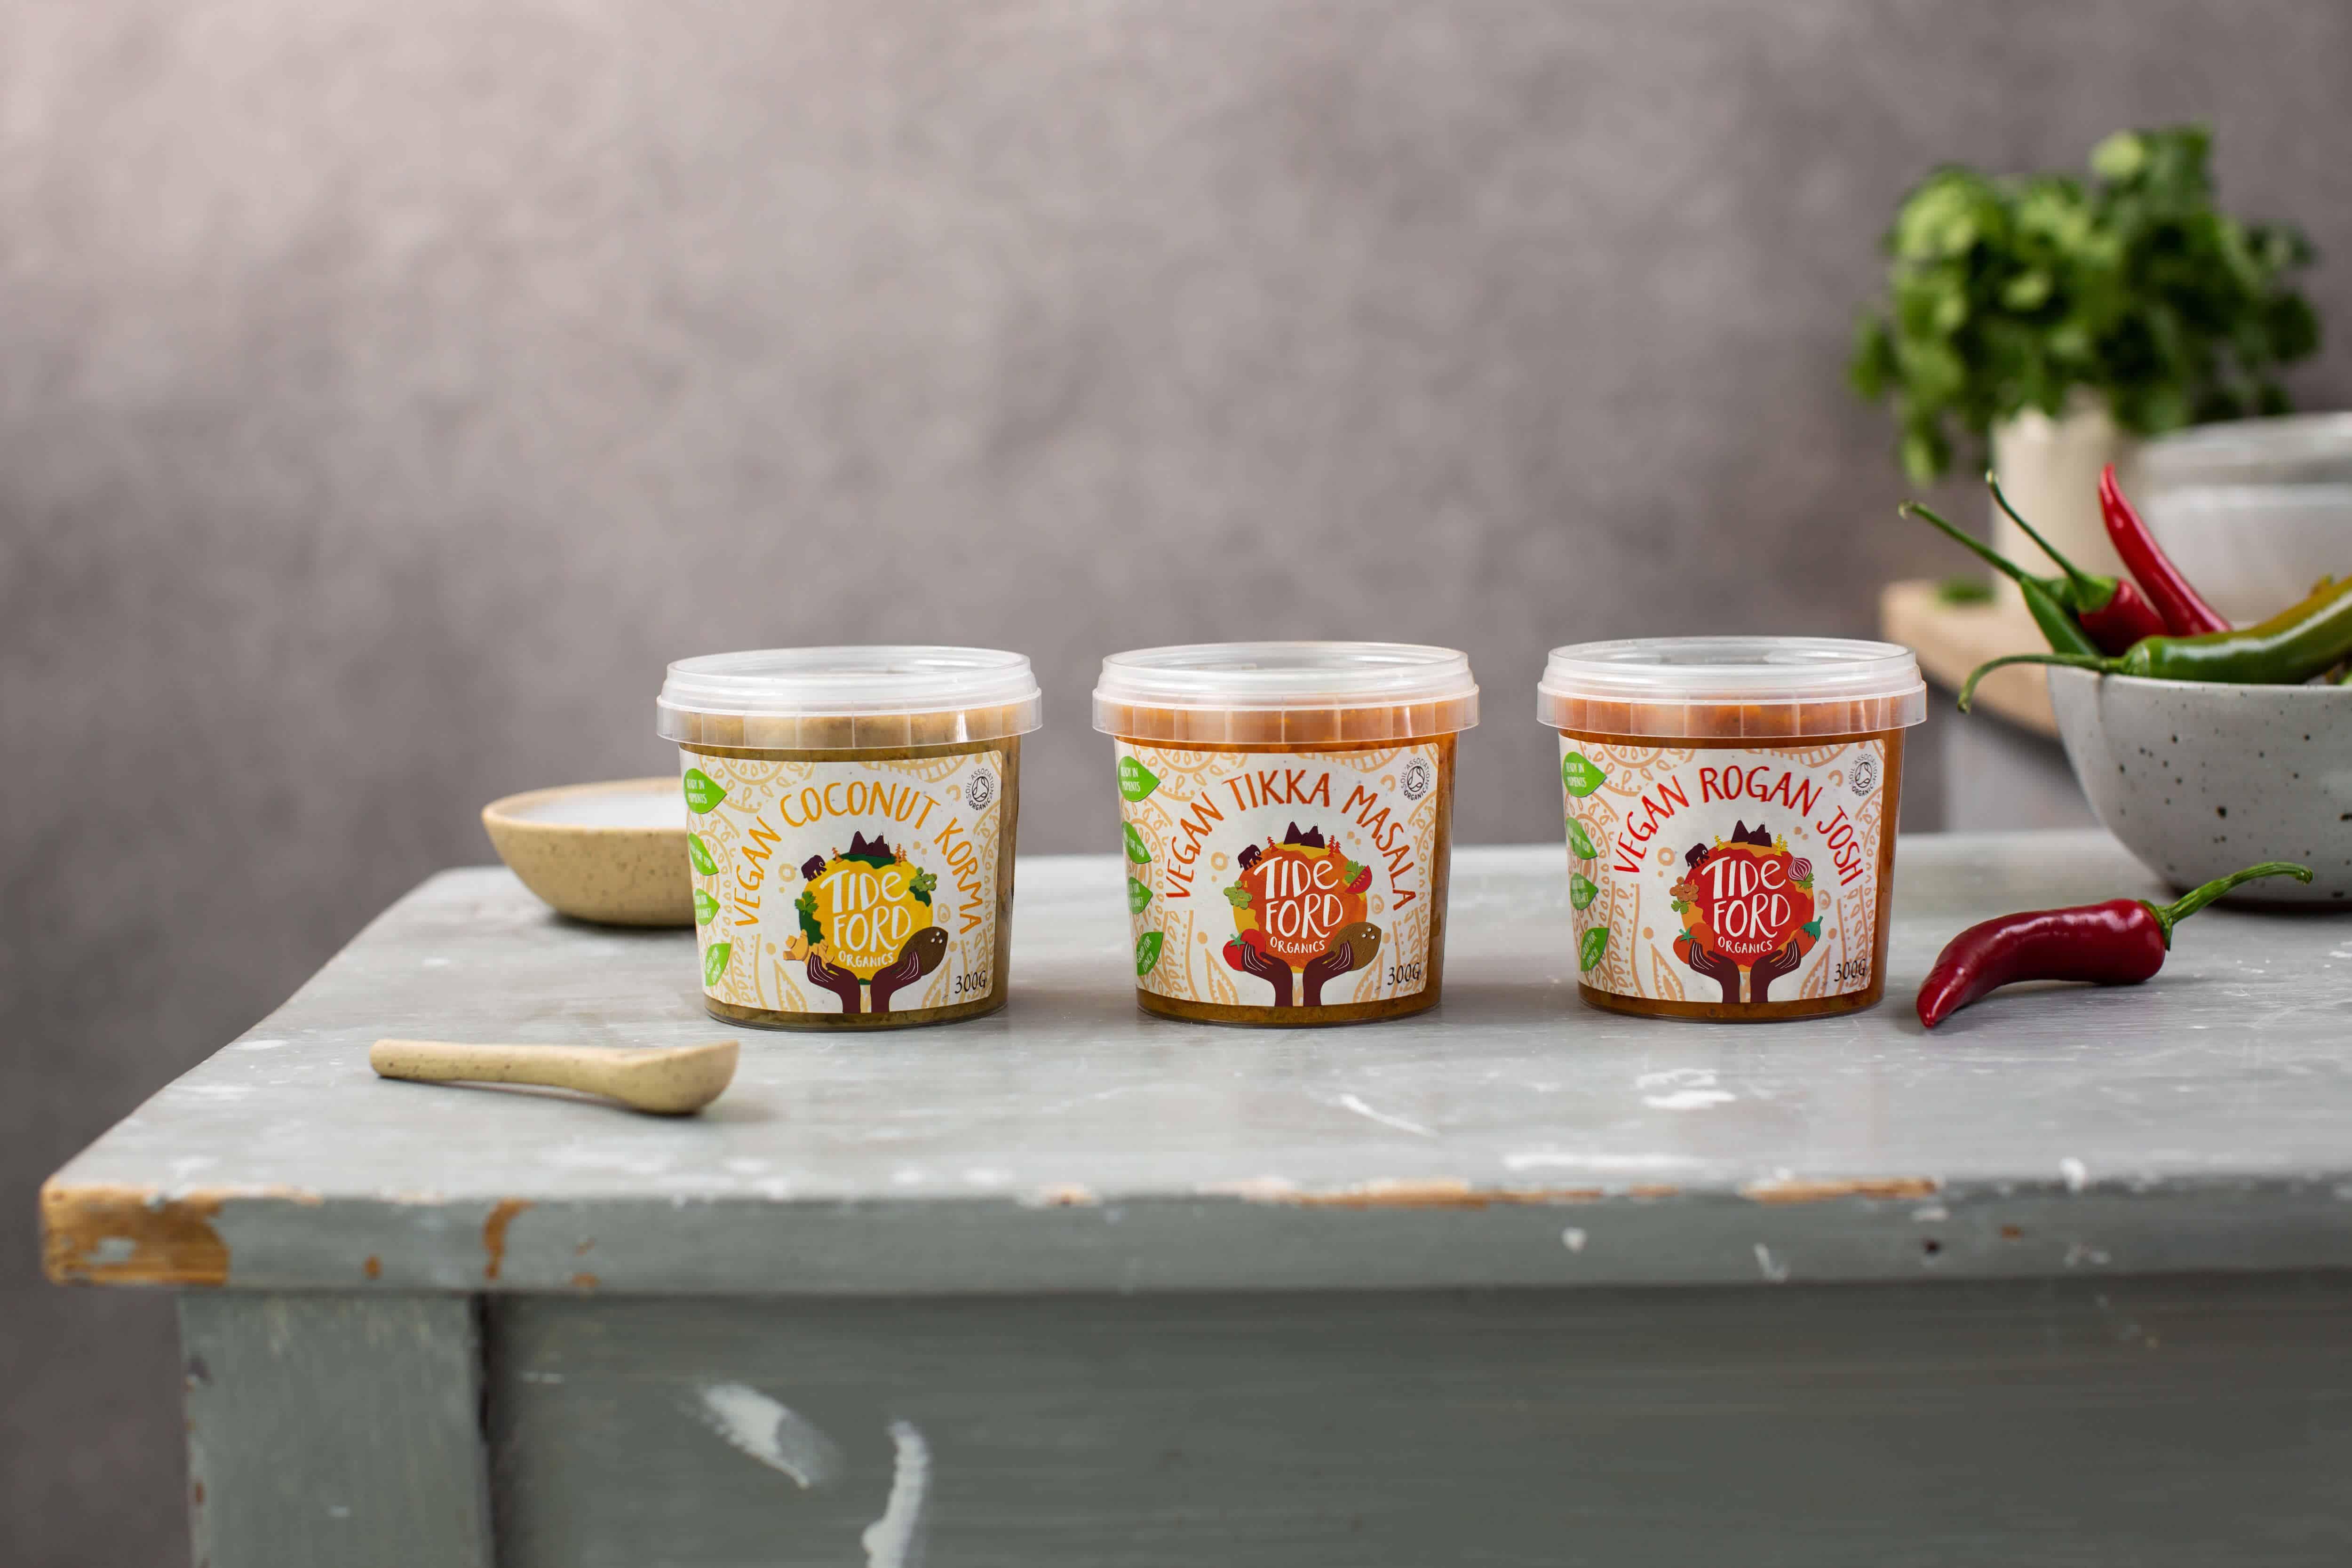 Tideford Organics curry pots